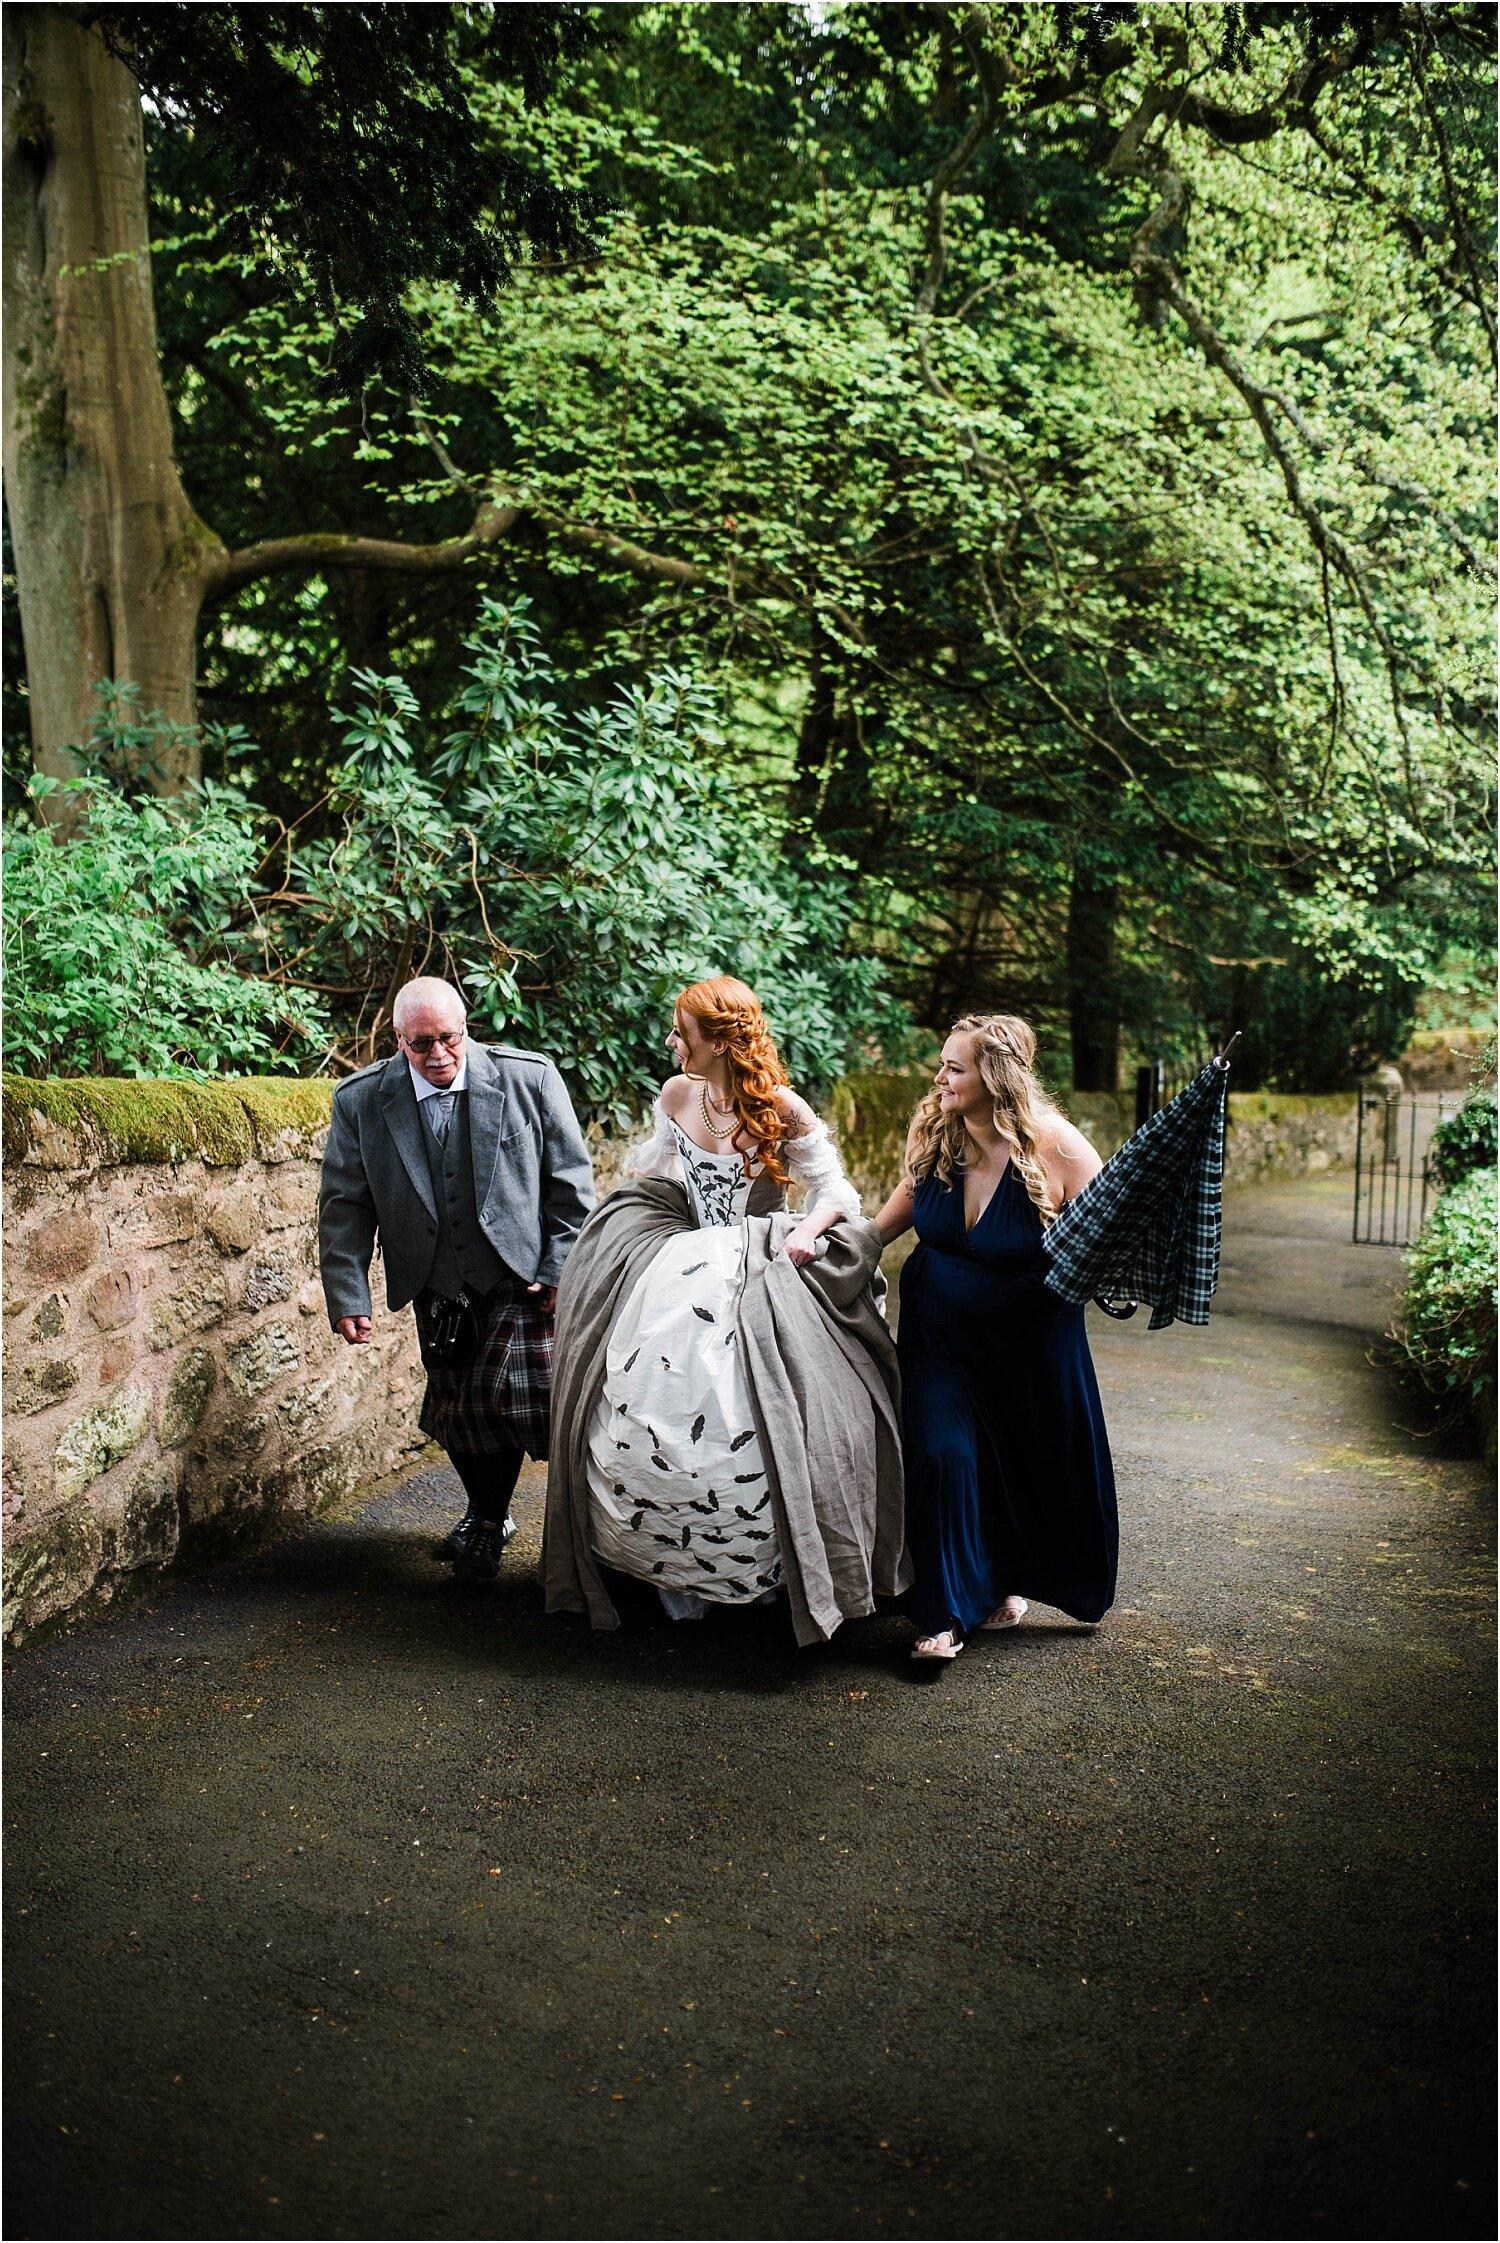 Wolf + Lea-Outlander-Inspired-Elopement-Wedding-Scotland_Gabby Chapin Photography_034.jpg